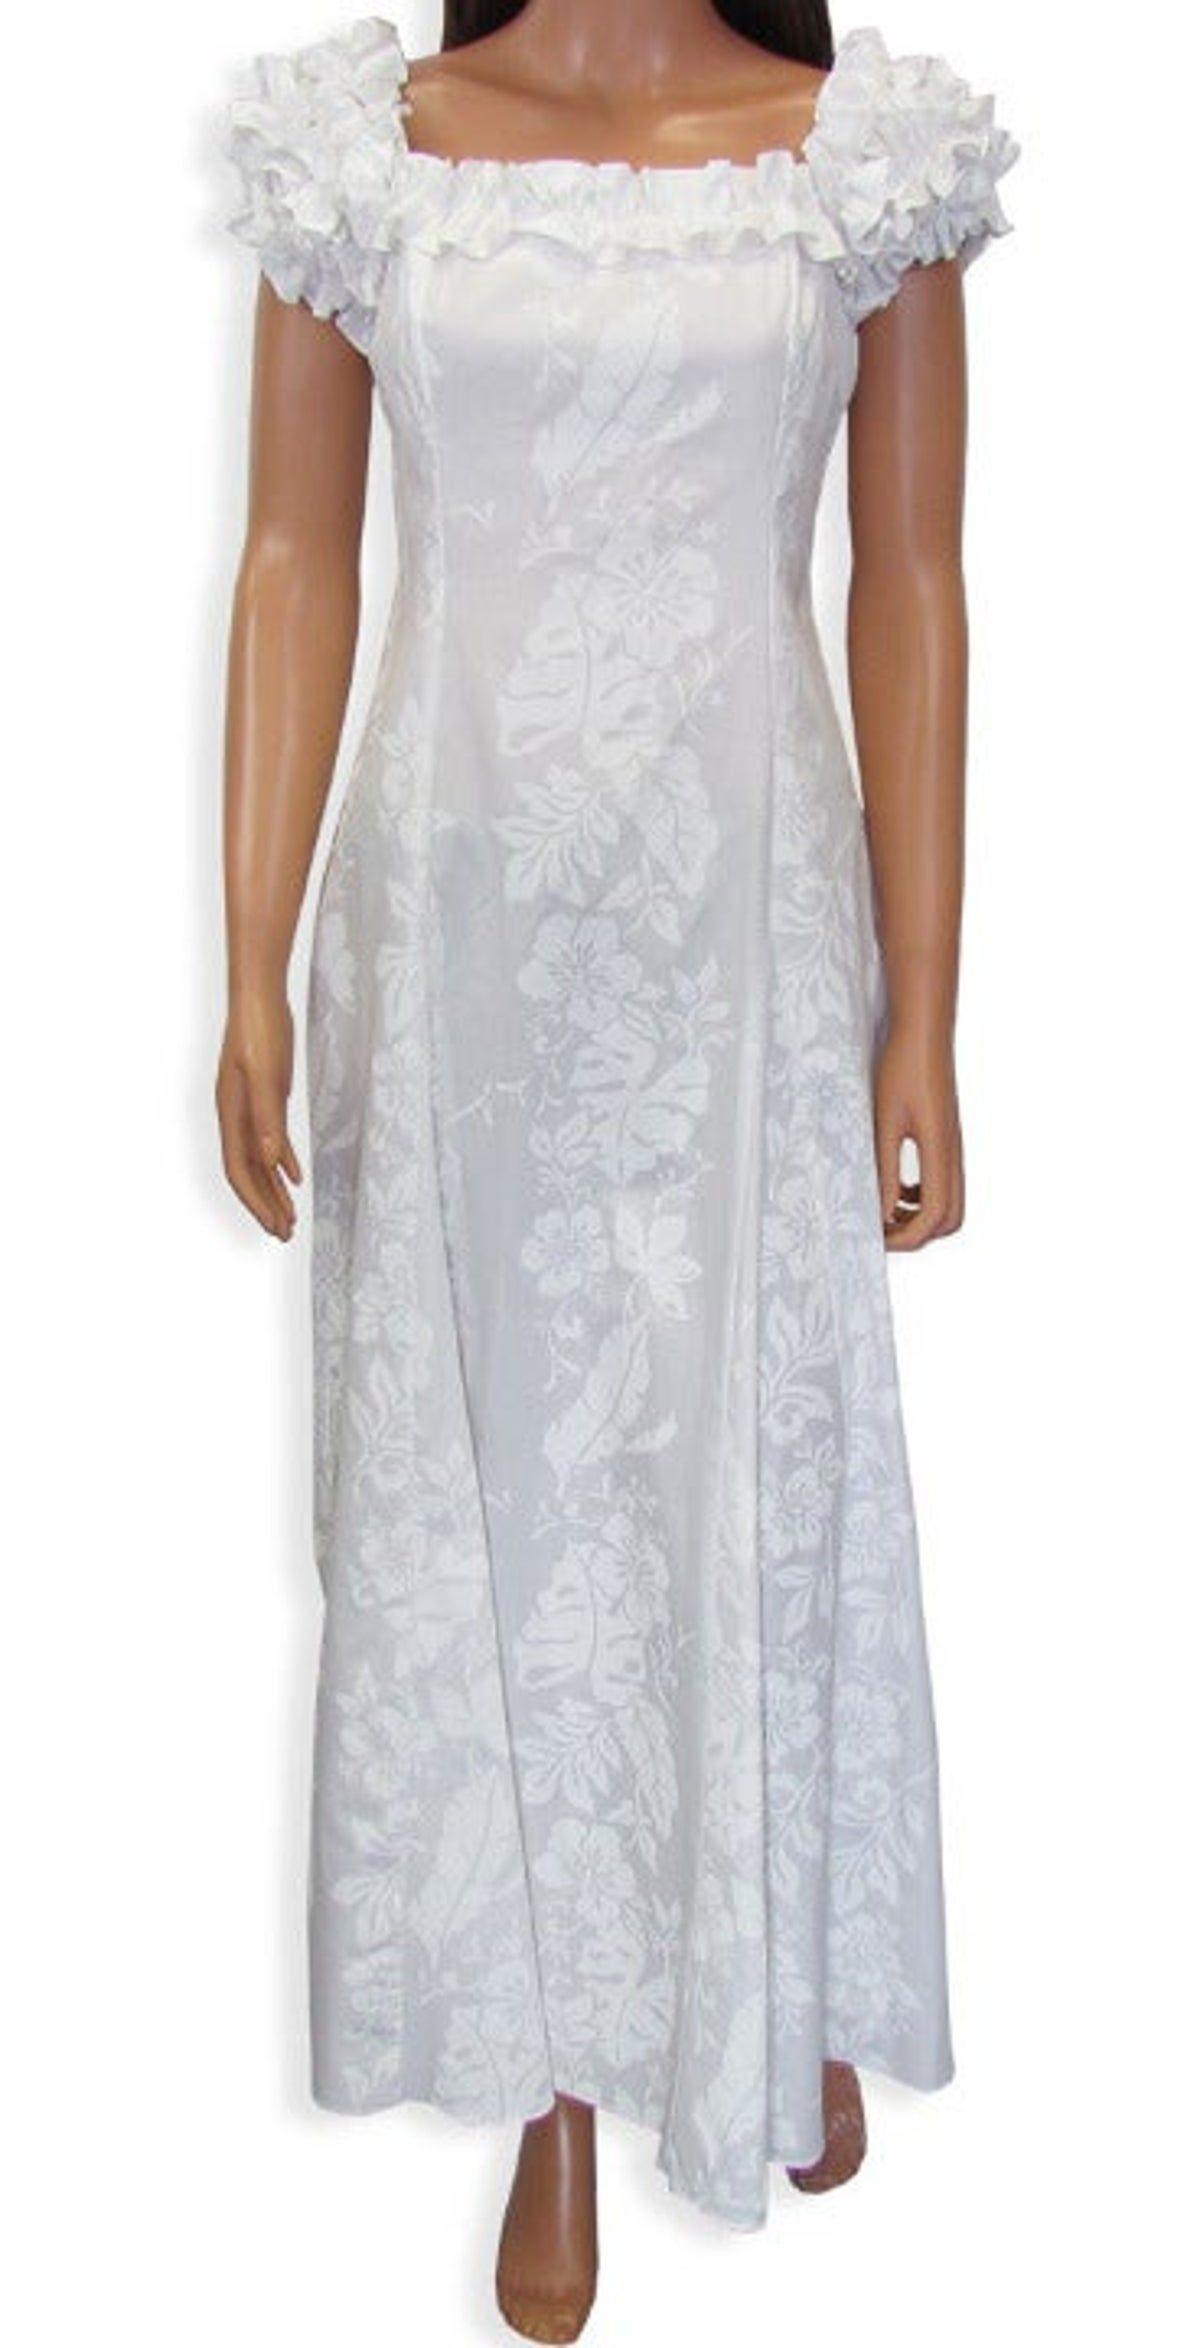 Hawaiian Wedding Dresses Plus Size Wedding Idea Tips Pictures And Photos Casual Wedding Dress Casual Beach Wedding Dress Wedding Dresses Plus Size [ 1520 x 1162 Pixel ]